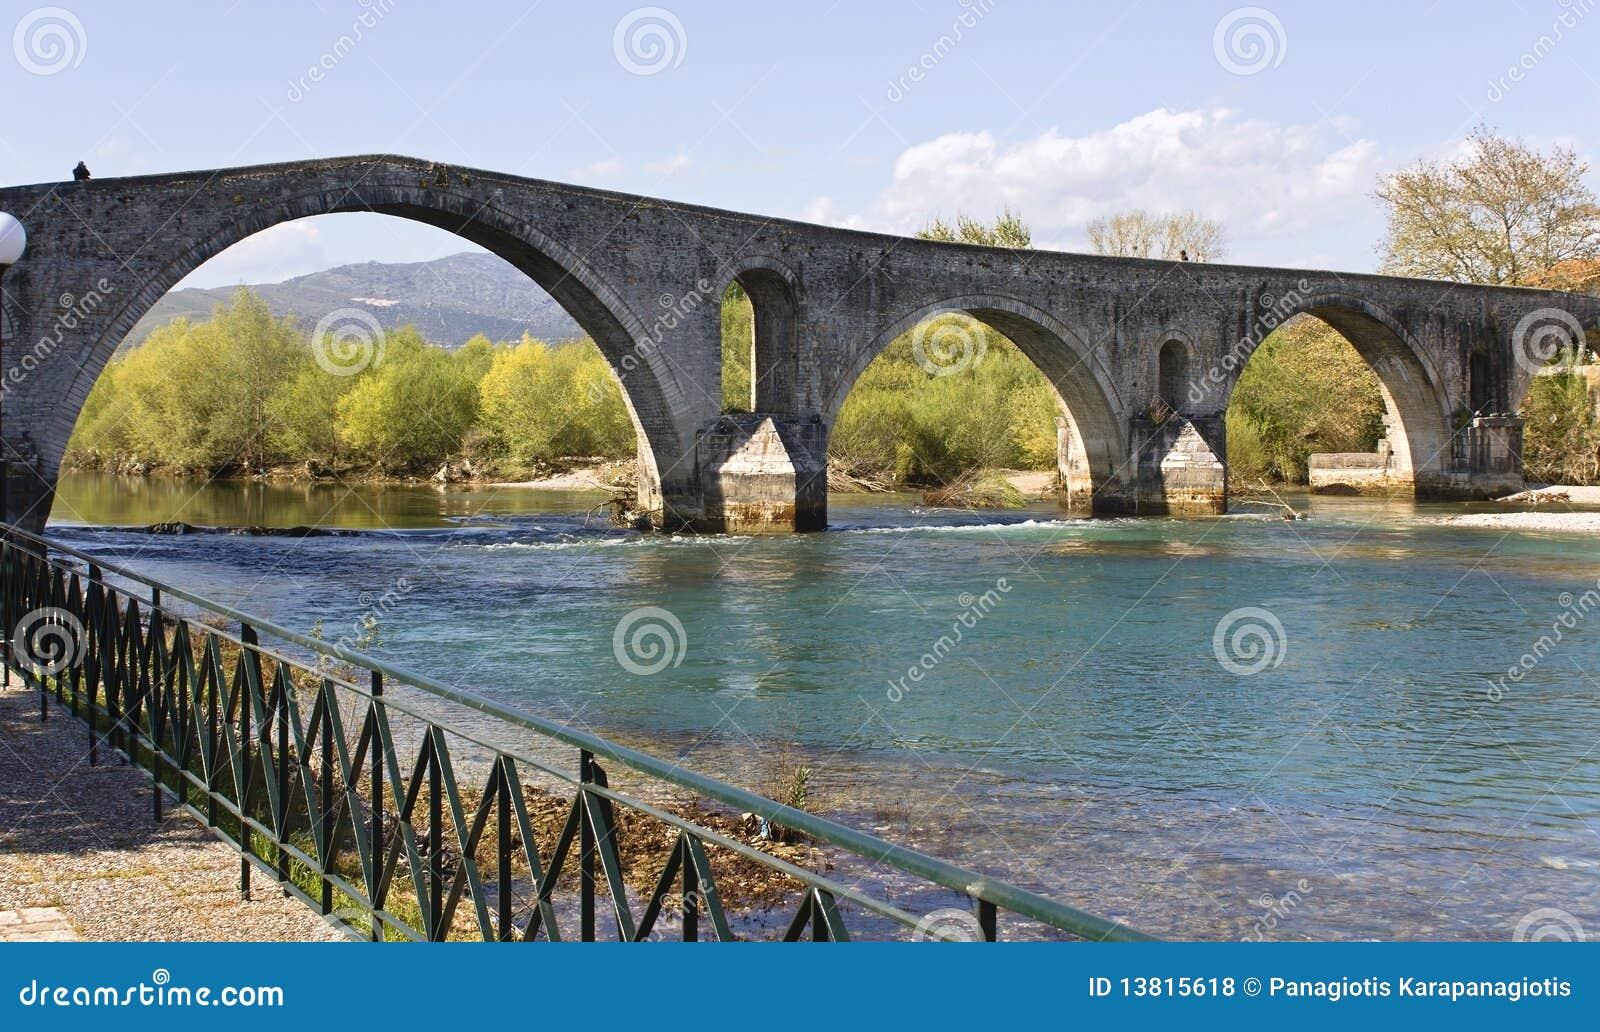 Historic Stone Bridge Of Arta At West Greece Royalty Free